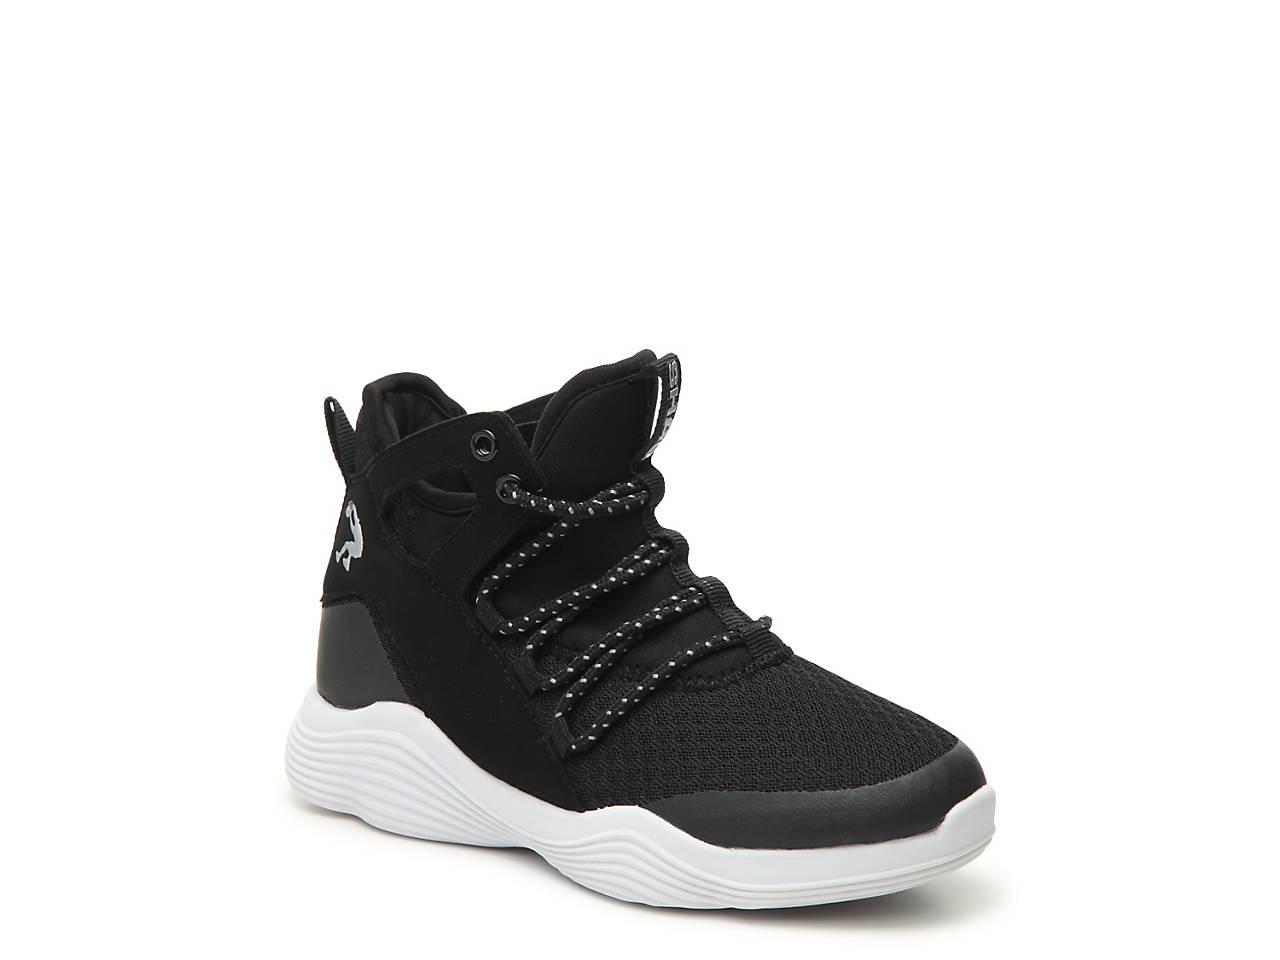 c9b3560c5b6 Shaq Flavor Youth Basketball Shoe Kids Shoes